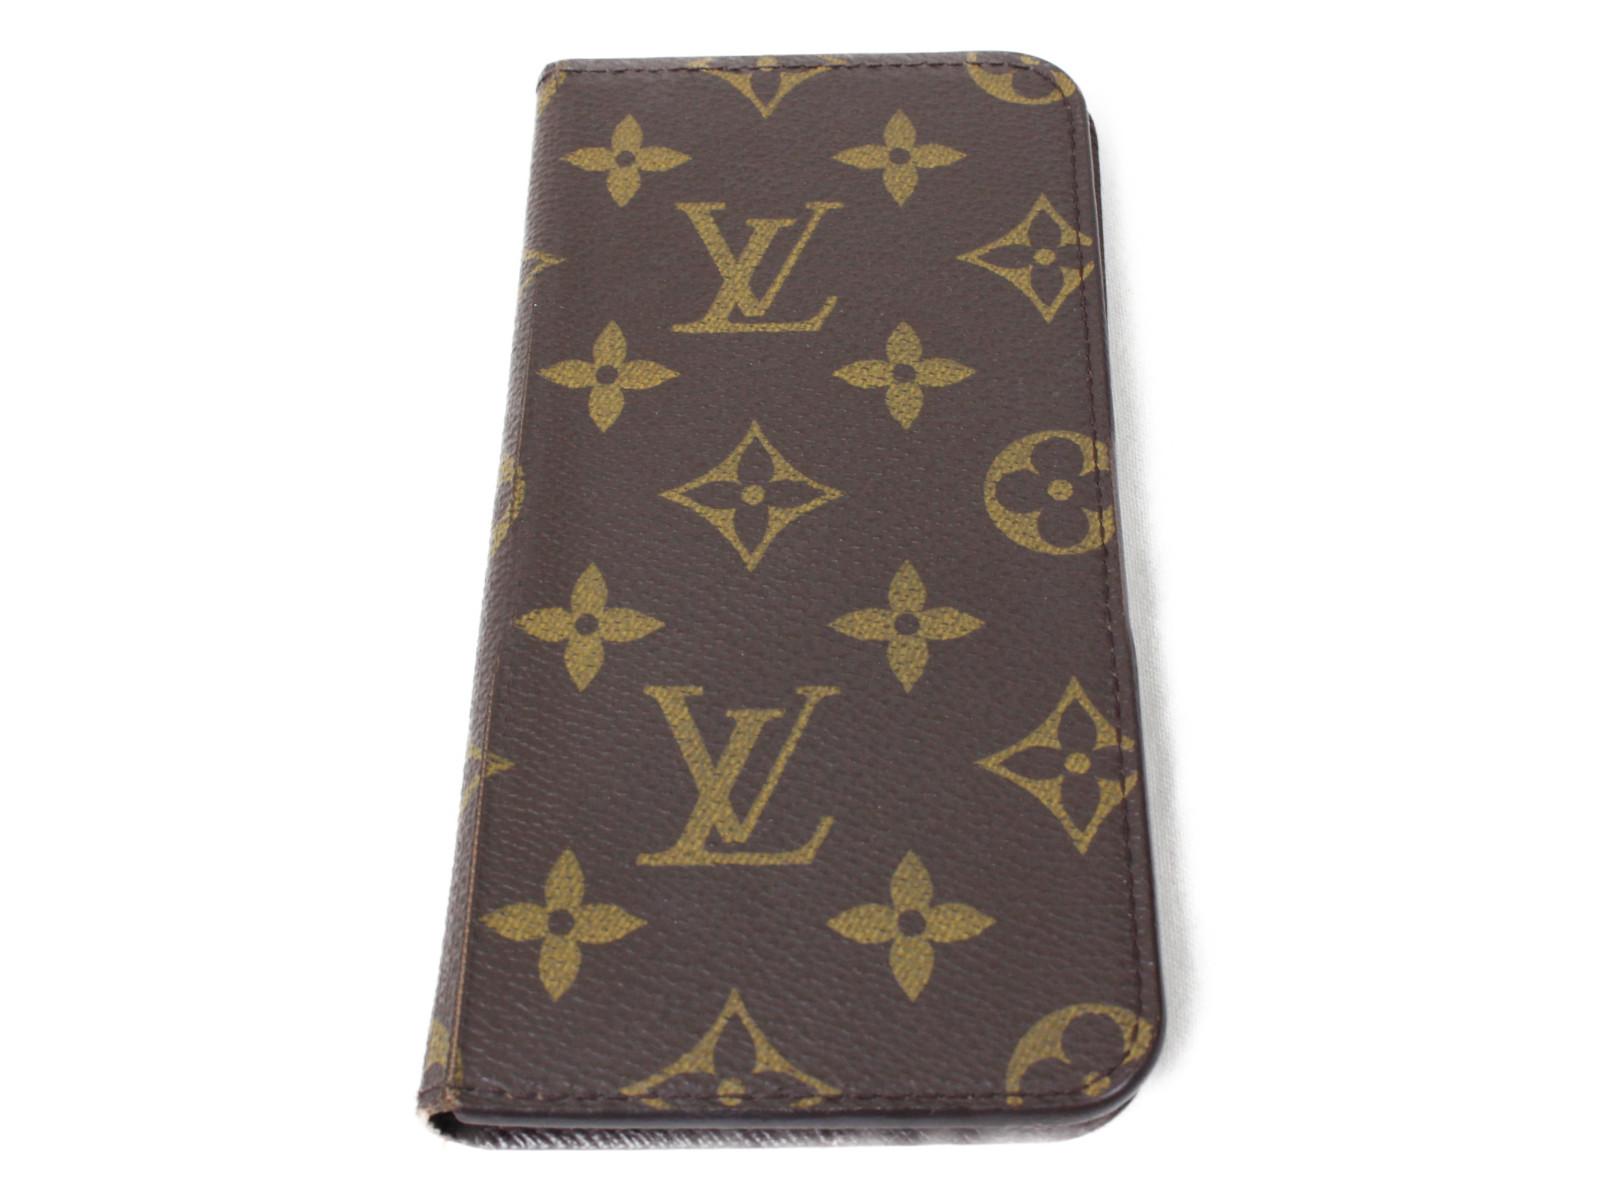 LOUIS VUITTON ルイヴィトン アイフォン6+ケース M61423 モノグラム シンプル プレゼント包装可 【中古】